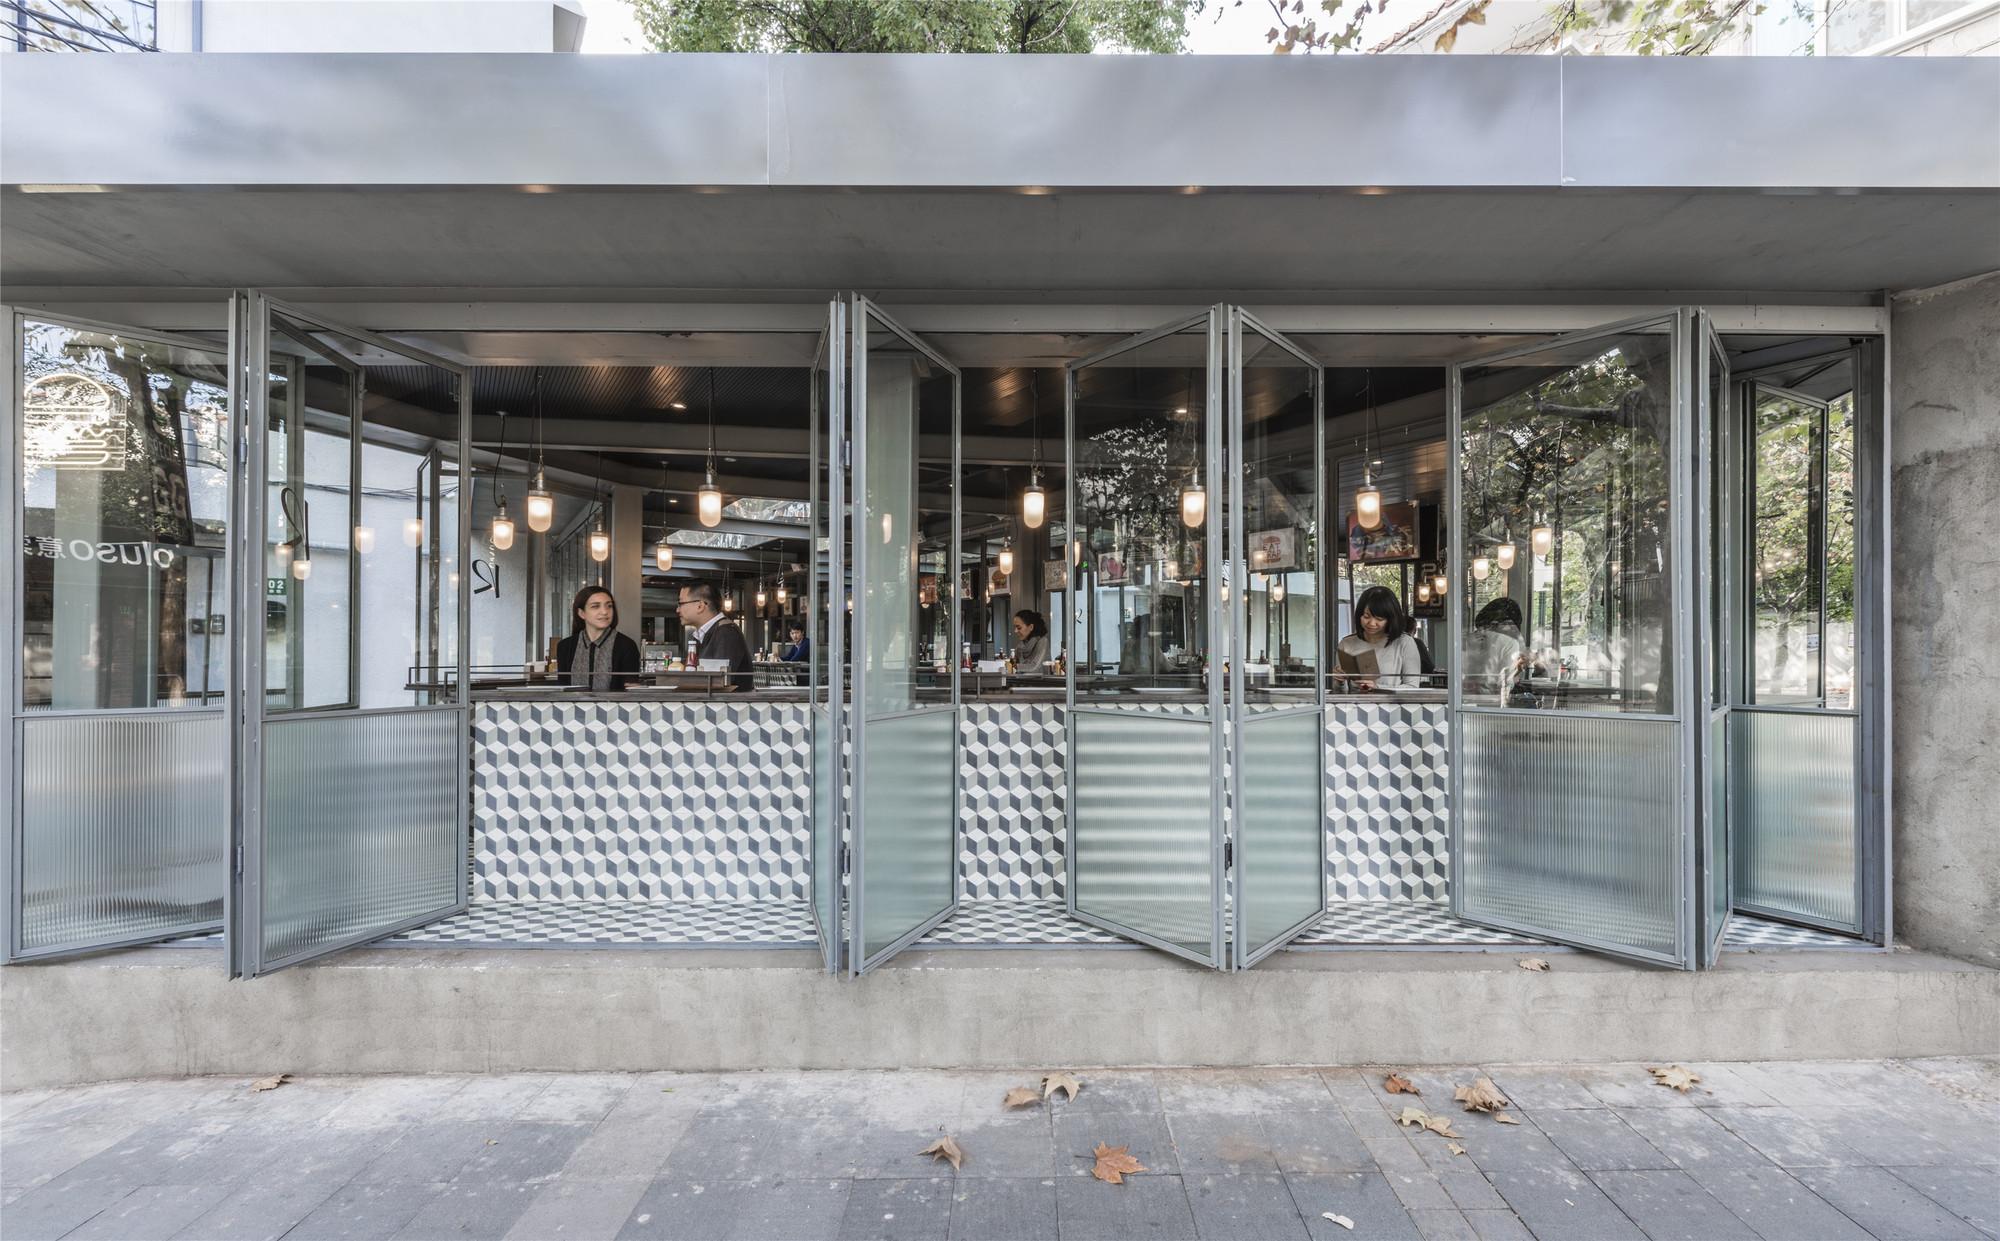 Gallery of rachel s burger neri hu design and research - Racholas exterior ...